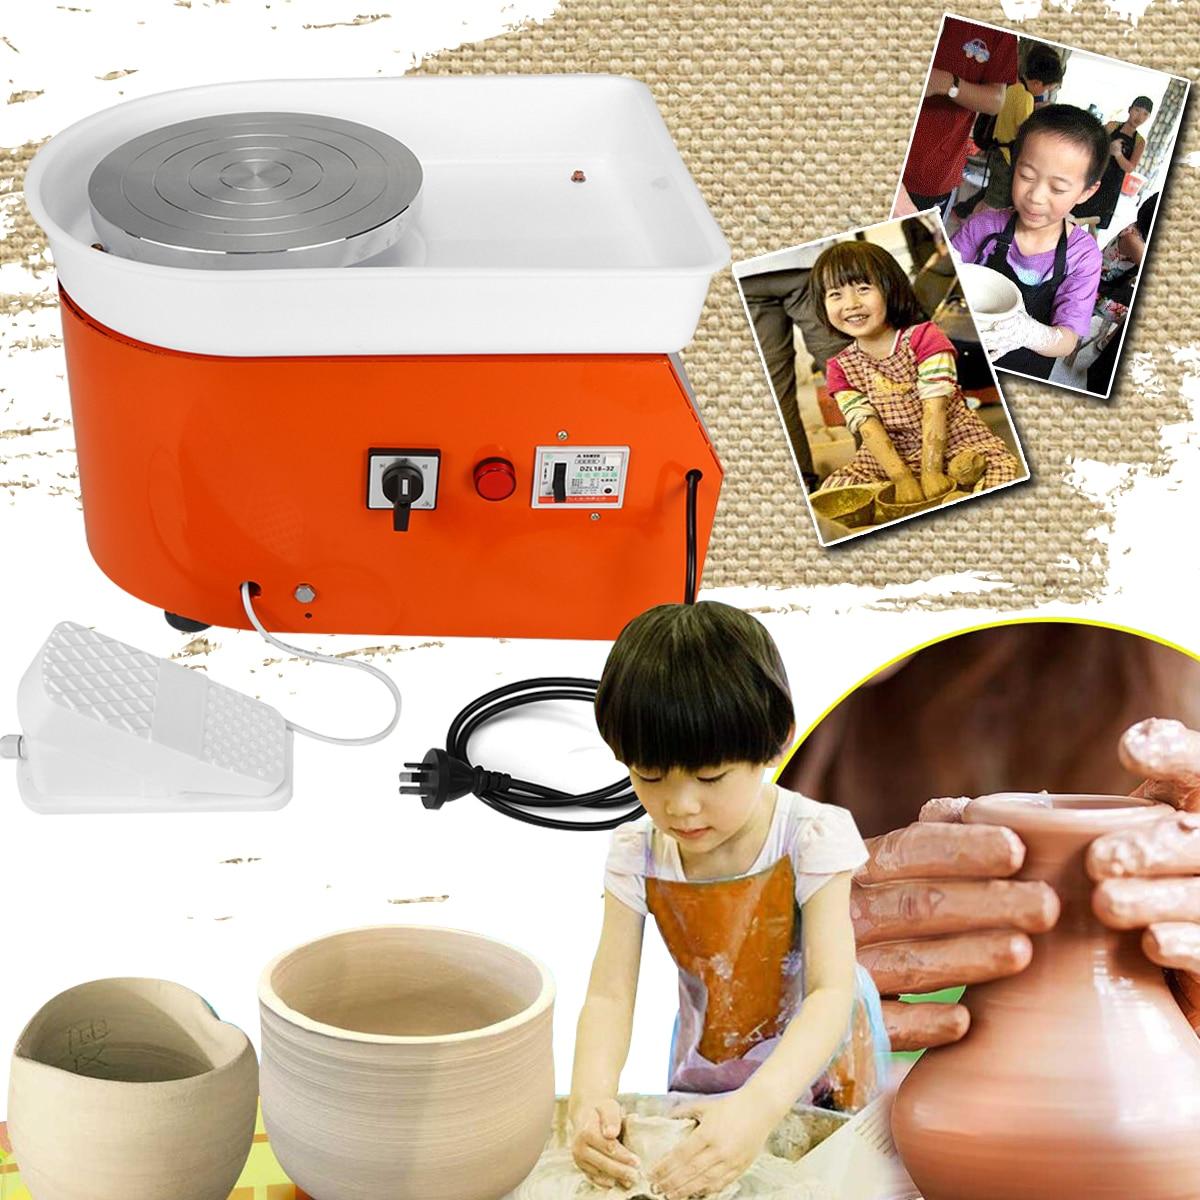 25cm Pottery Wheel Machine Ceramic Work Ceramics Clay Art EU/AU AC220V 250 350W With Mobile Flexible Foot Pedal Smooth Low Noise